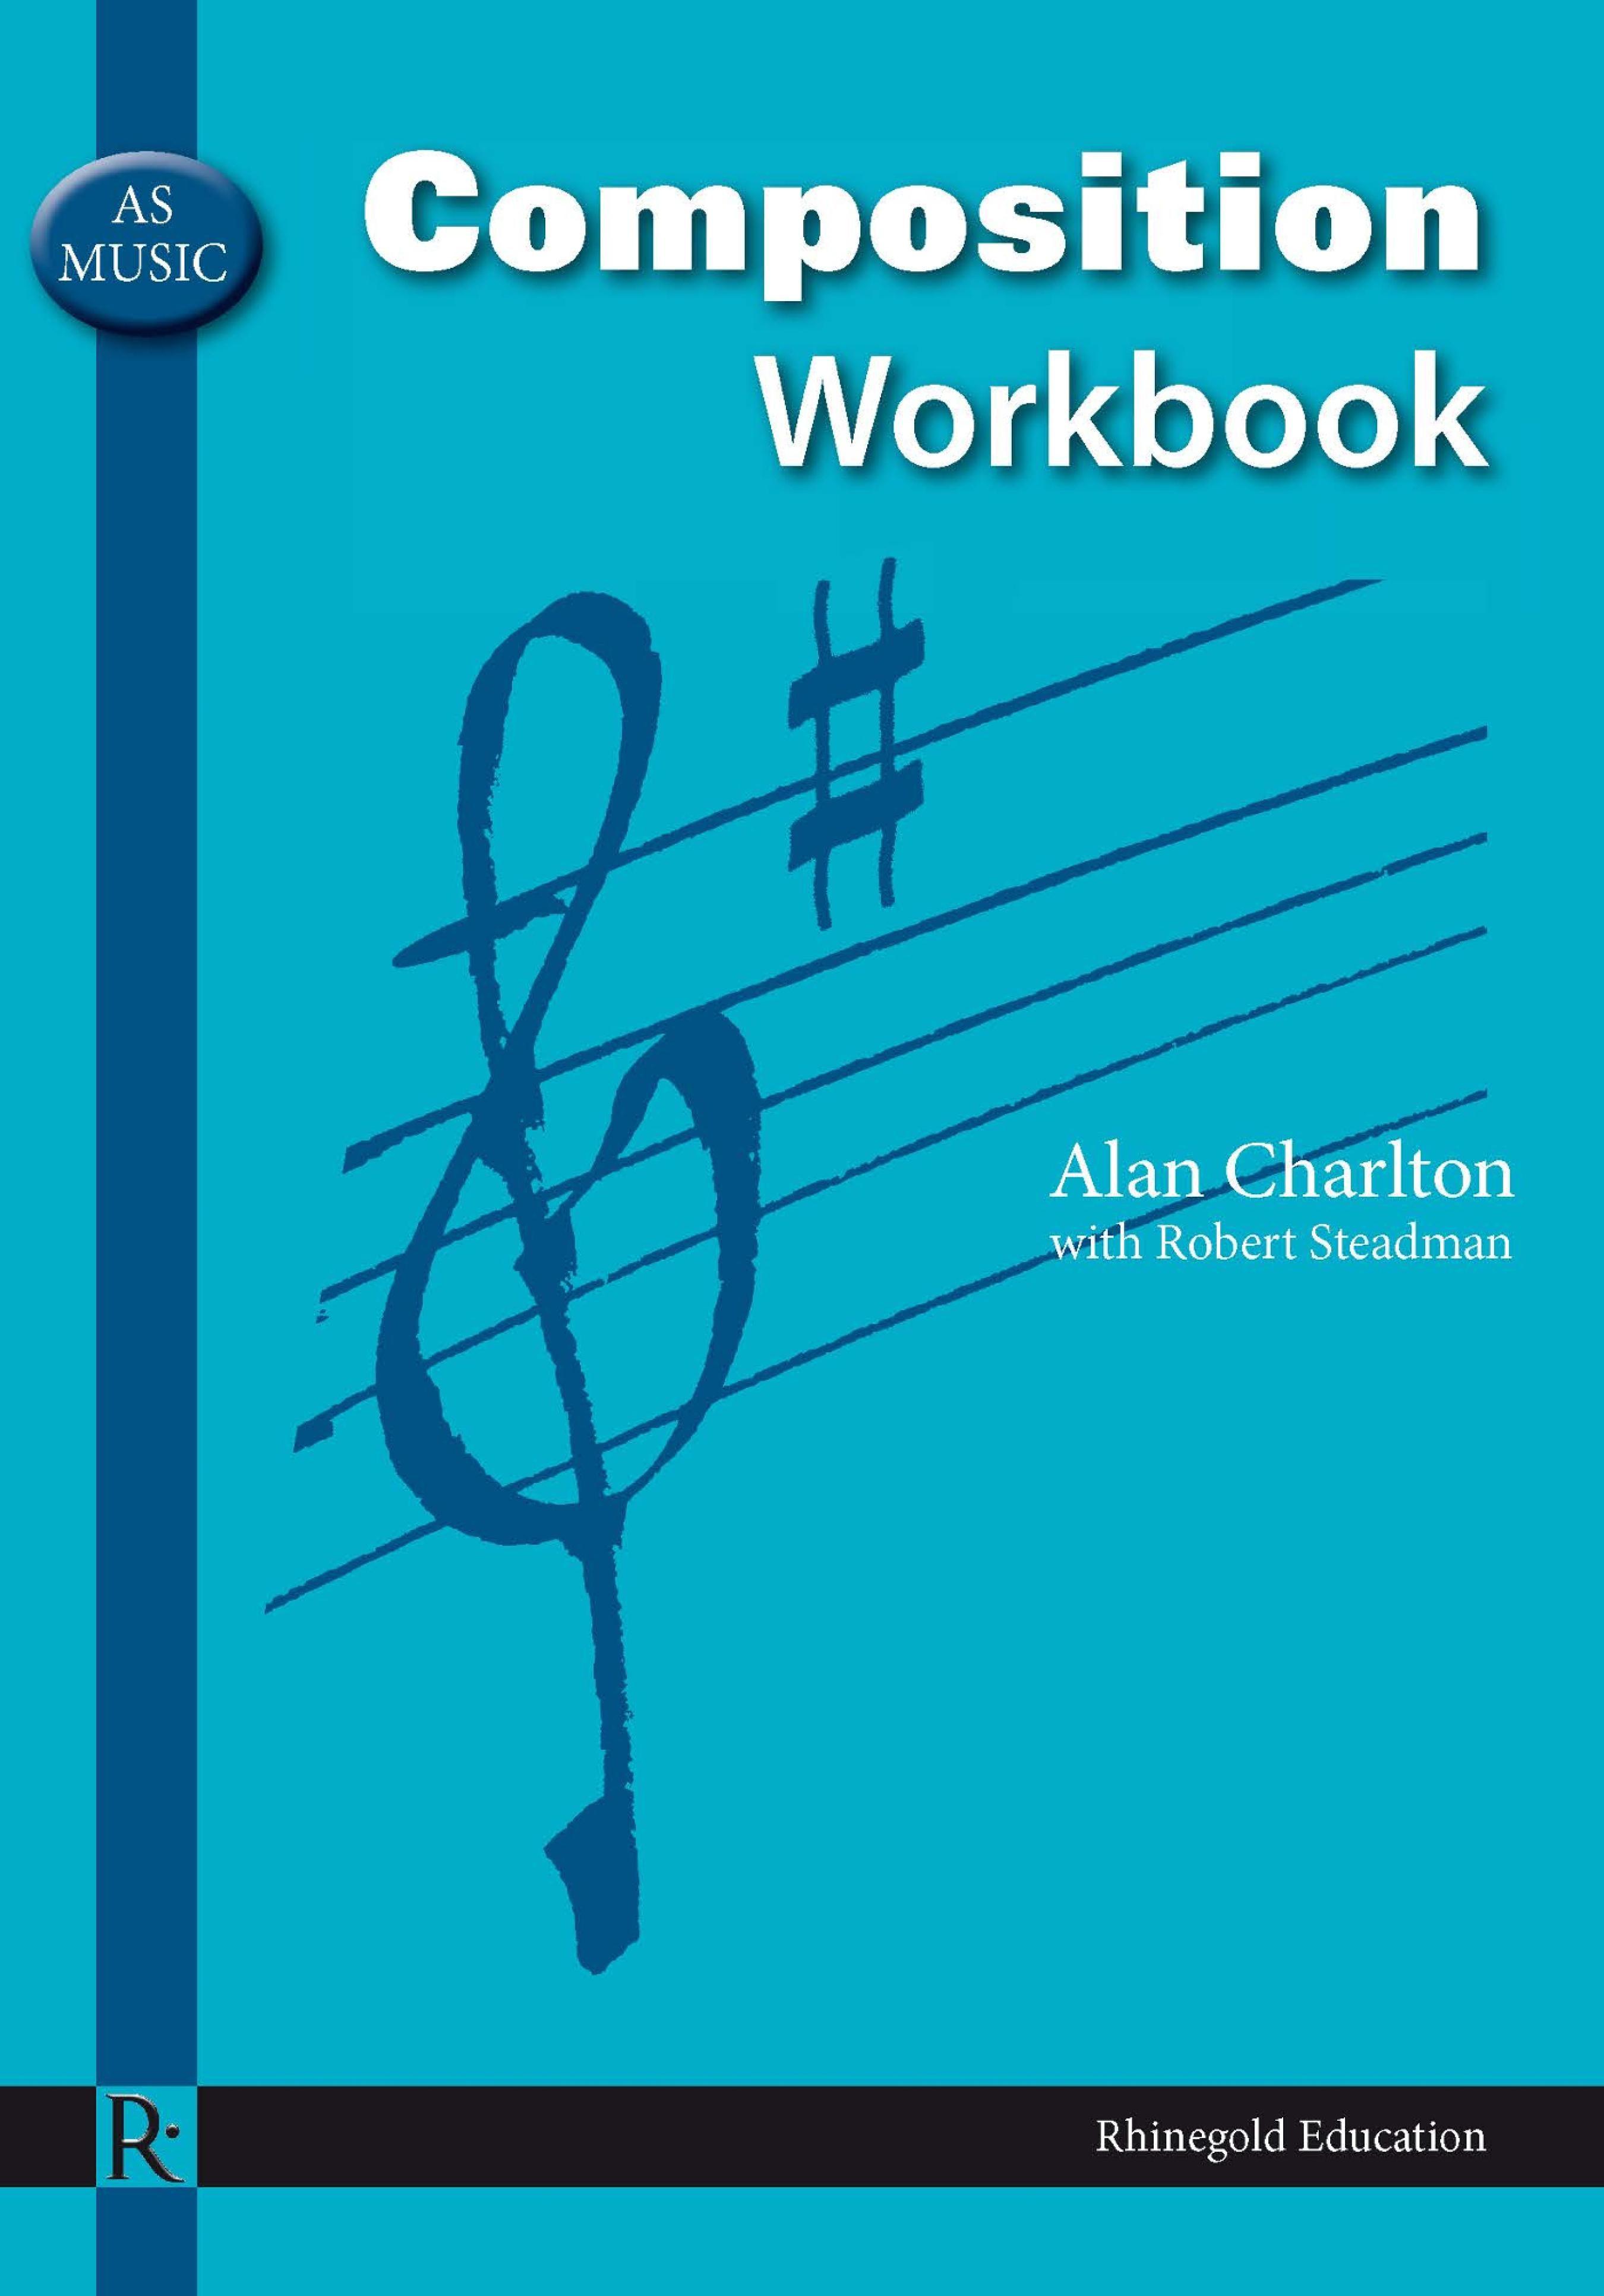 AS MUSIC COMPOSITION WORKBOOK EBOOK | ALAN CHARLTON | Descargar ...